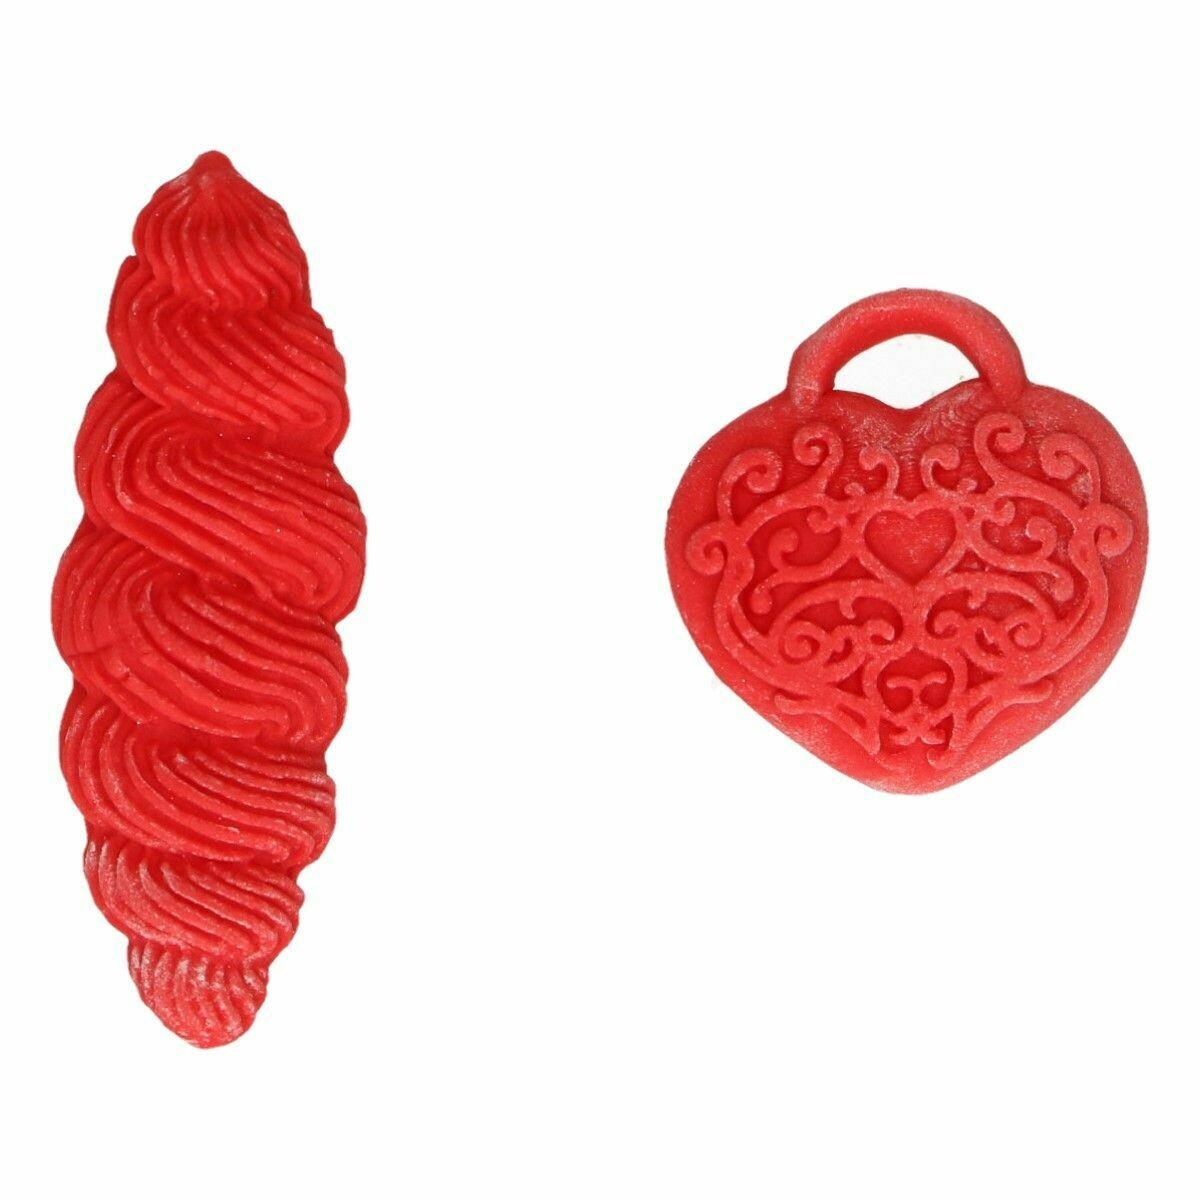 FunCakes FunColours GEL -RED -Χρώμα Πάστας -Κόκκκινο 30γρ